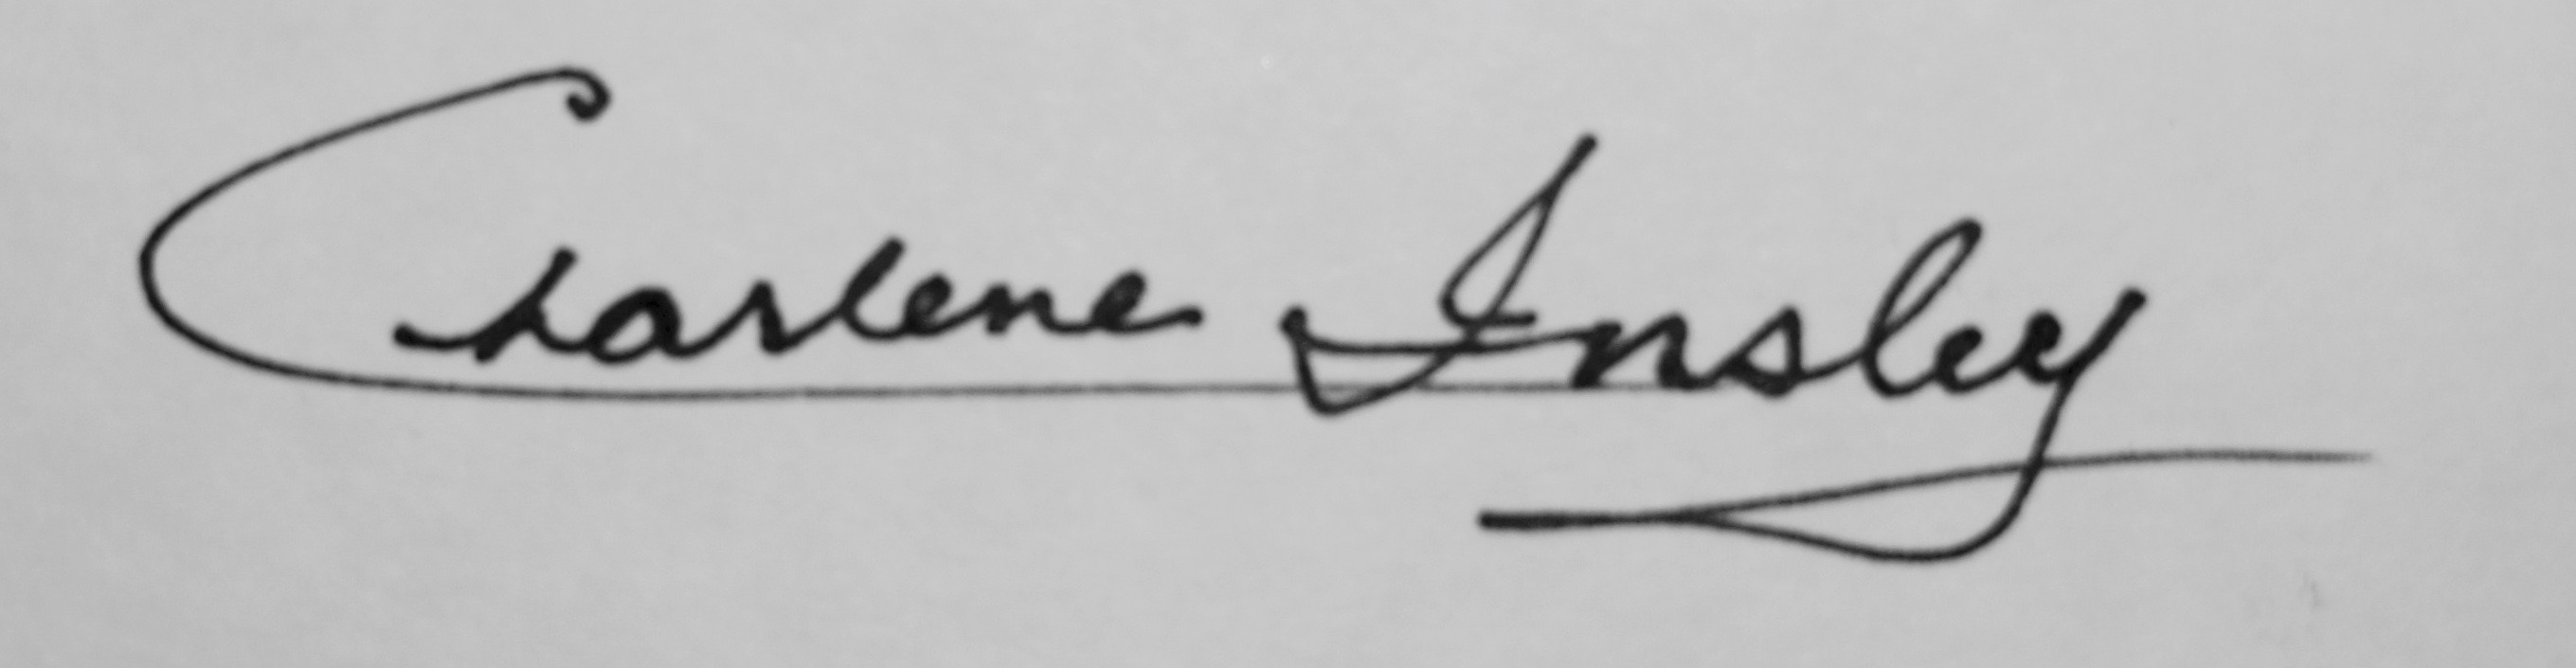 Charlene Insley's Signature